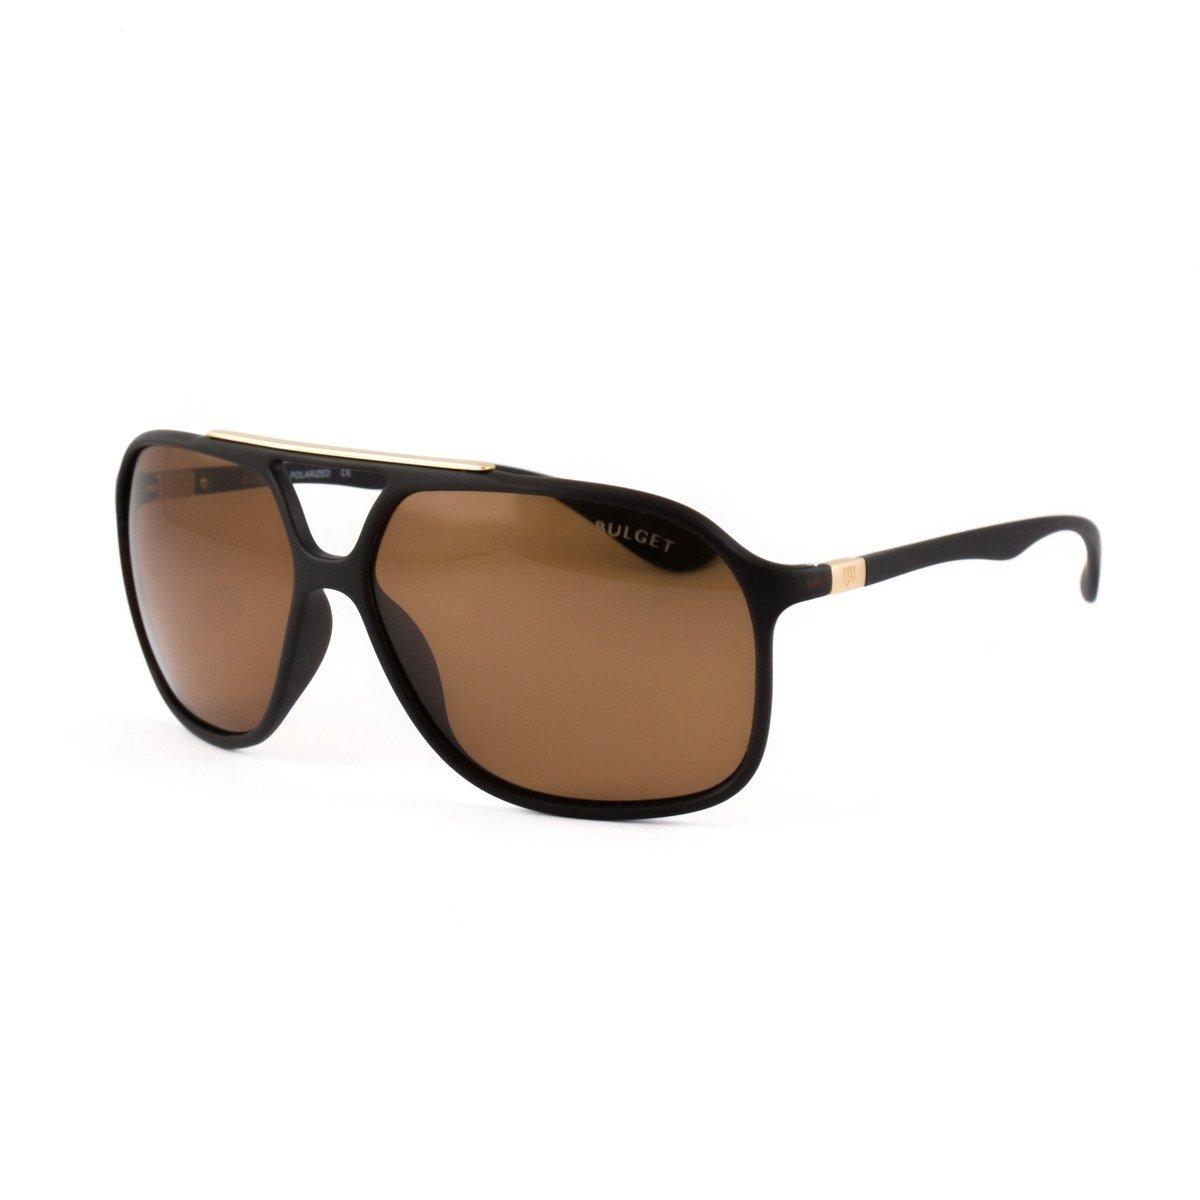 59a86bc6bf043 Óculos Bulget De Sol Polarizado - Compre Agora   Netshoes